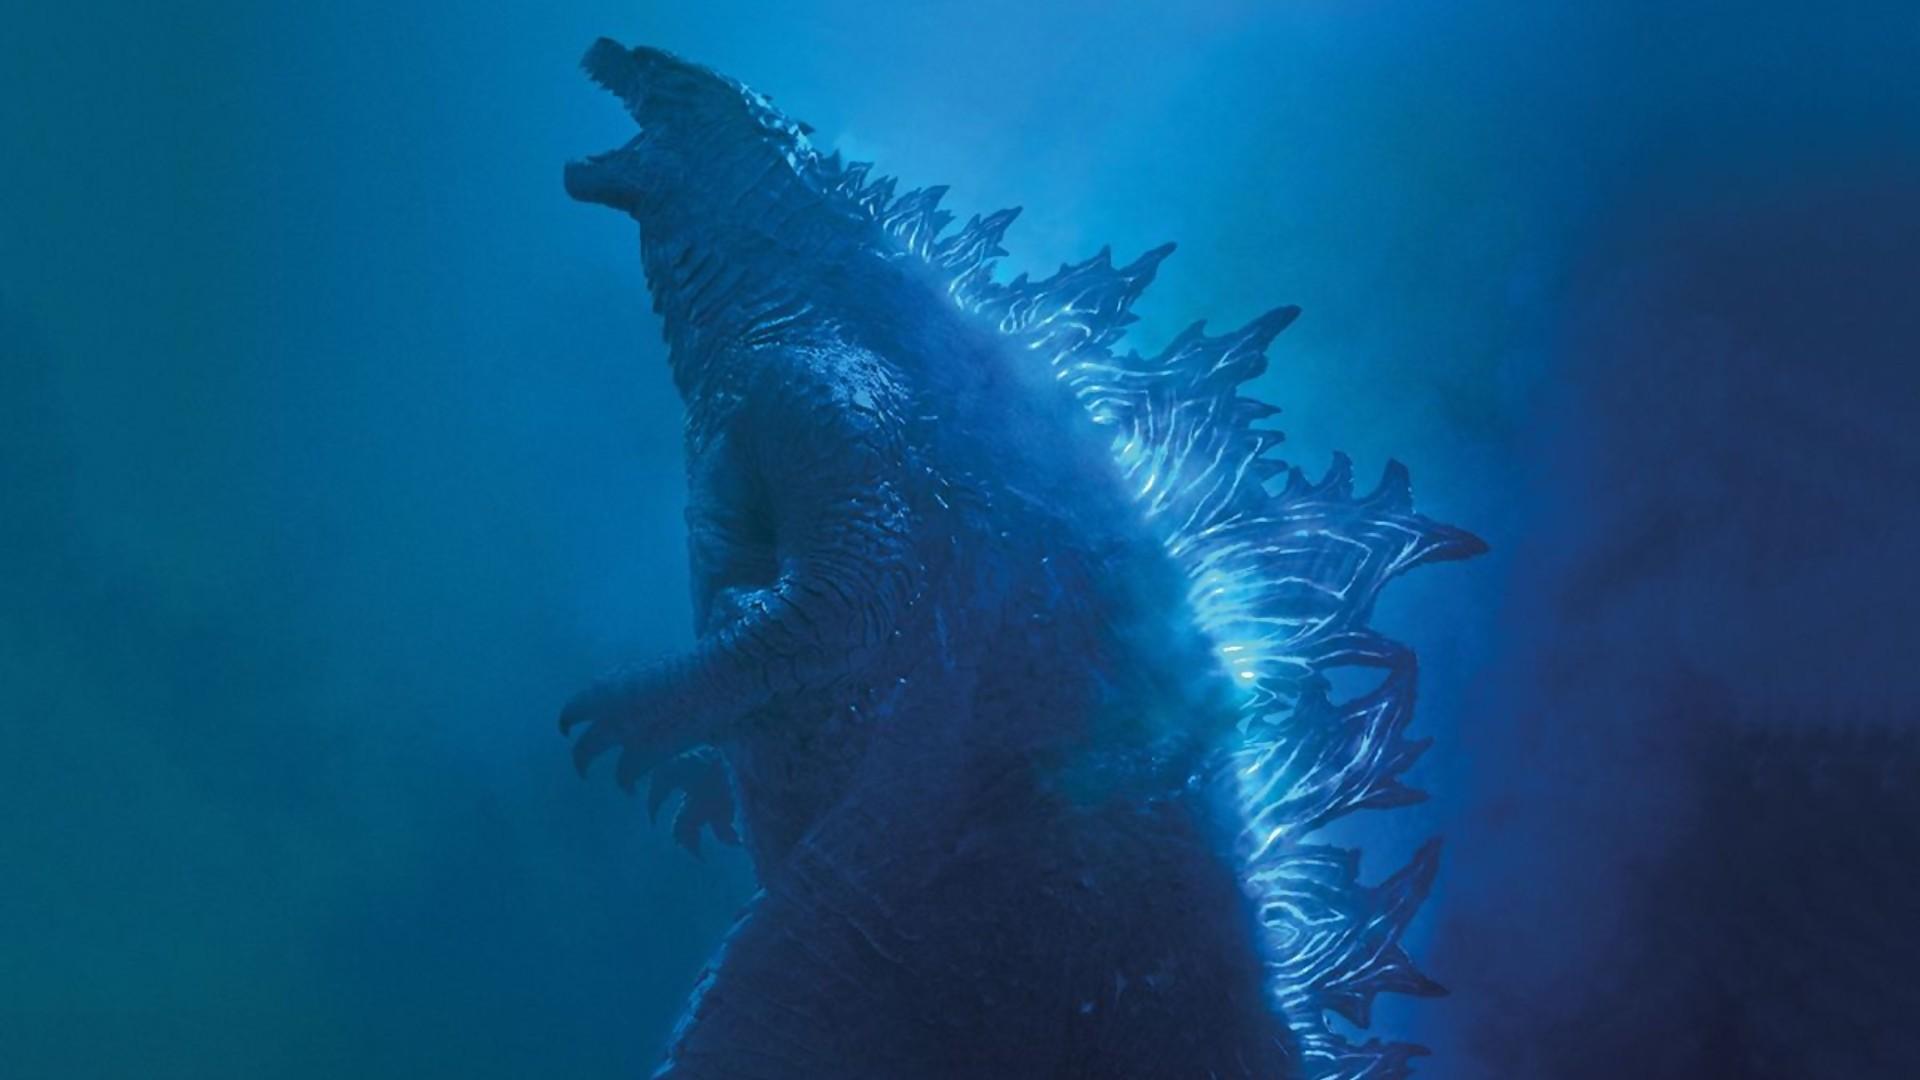 Godzilla 2, le roi des monstres – Critique de film